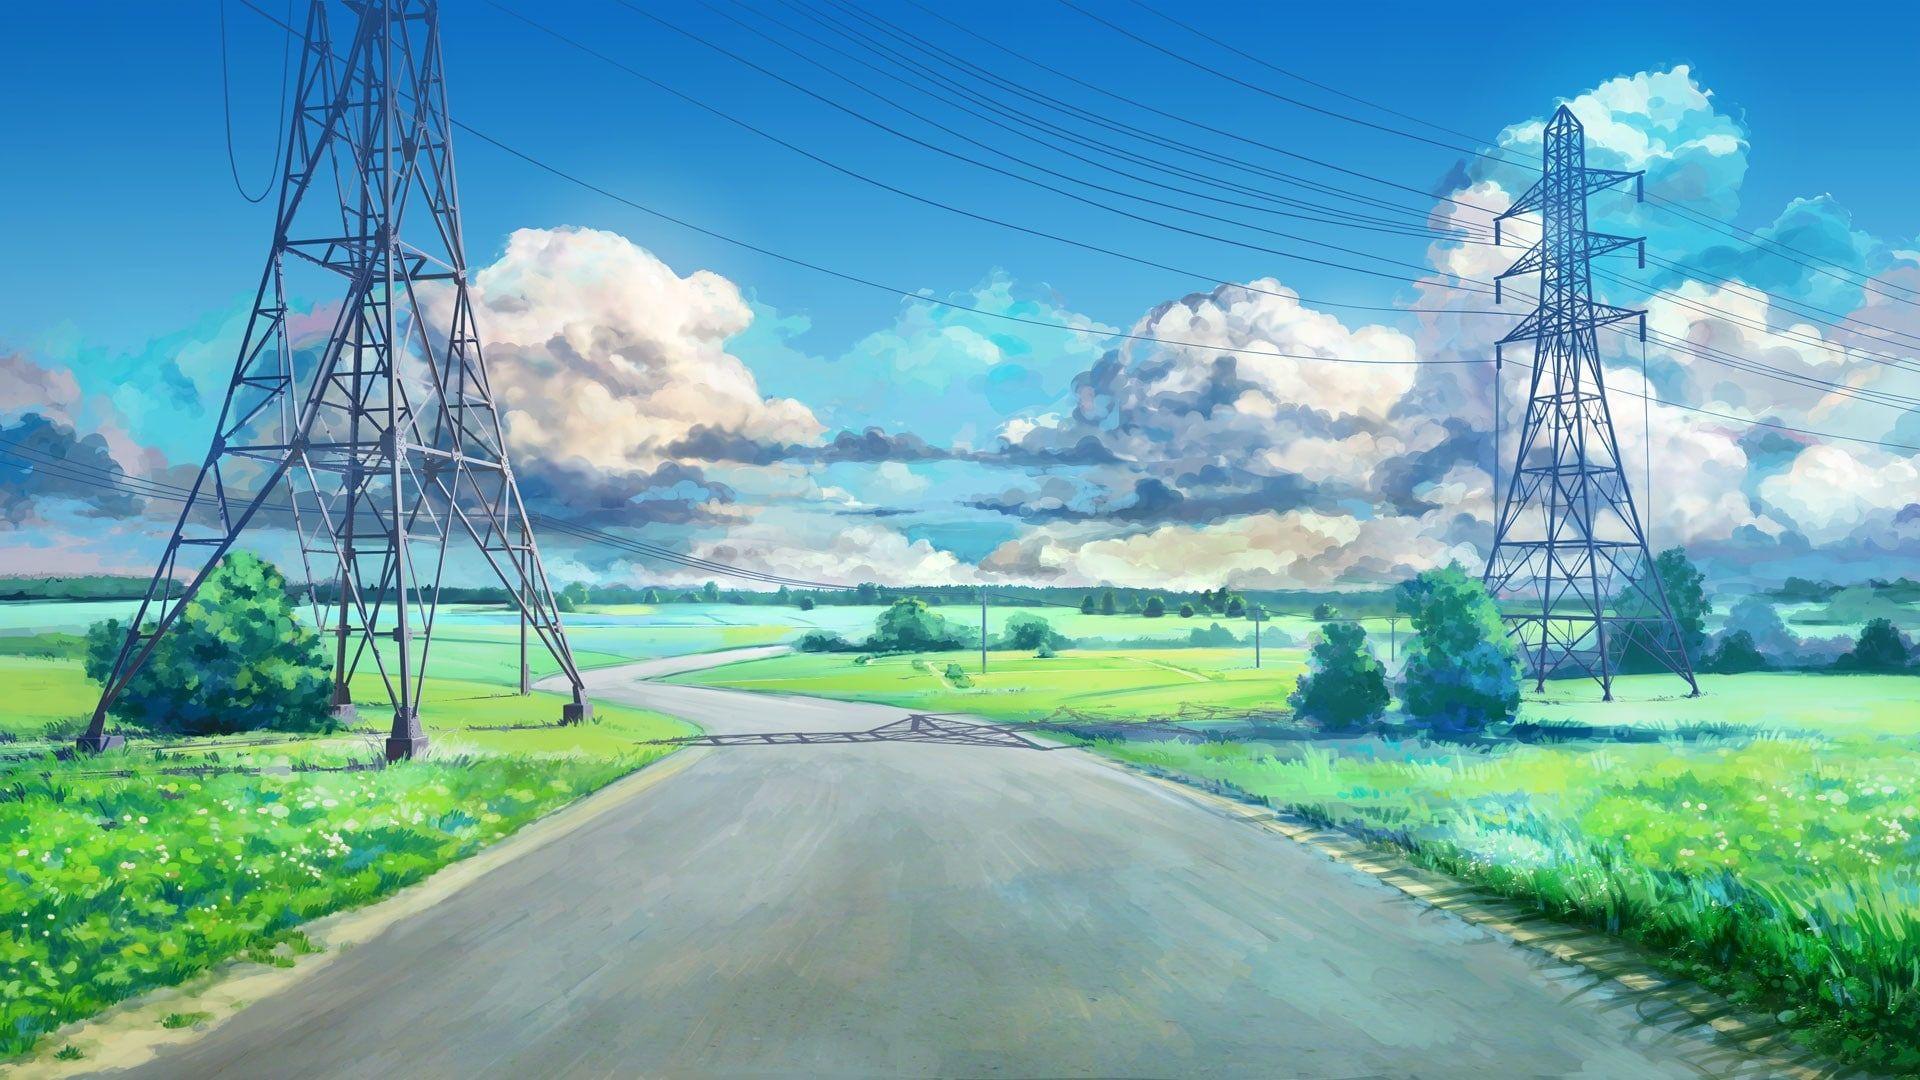 Clouds Blue Green Arsenixc Anime Landscape Road Power Lines Everlasting Summer Utility Pole Visual Novel 1080p Wallp Visual Novel Hd Wallpaper Name Wallpaper